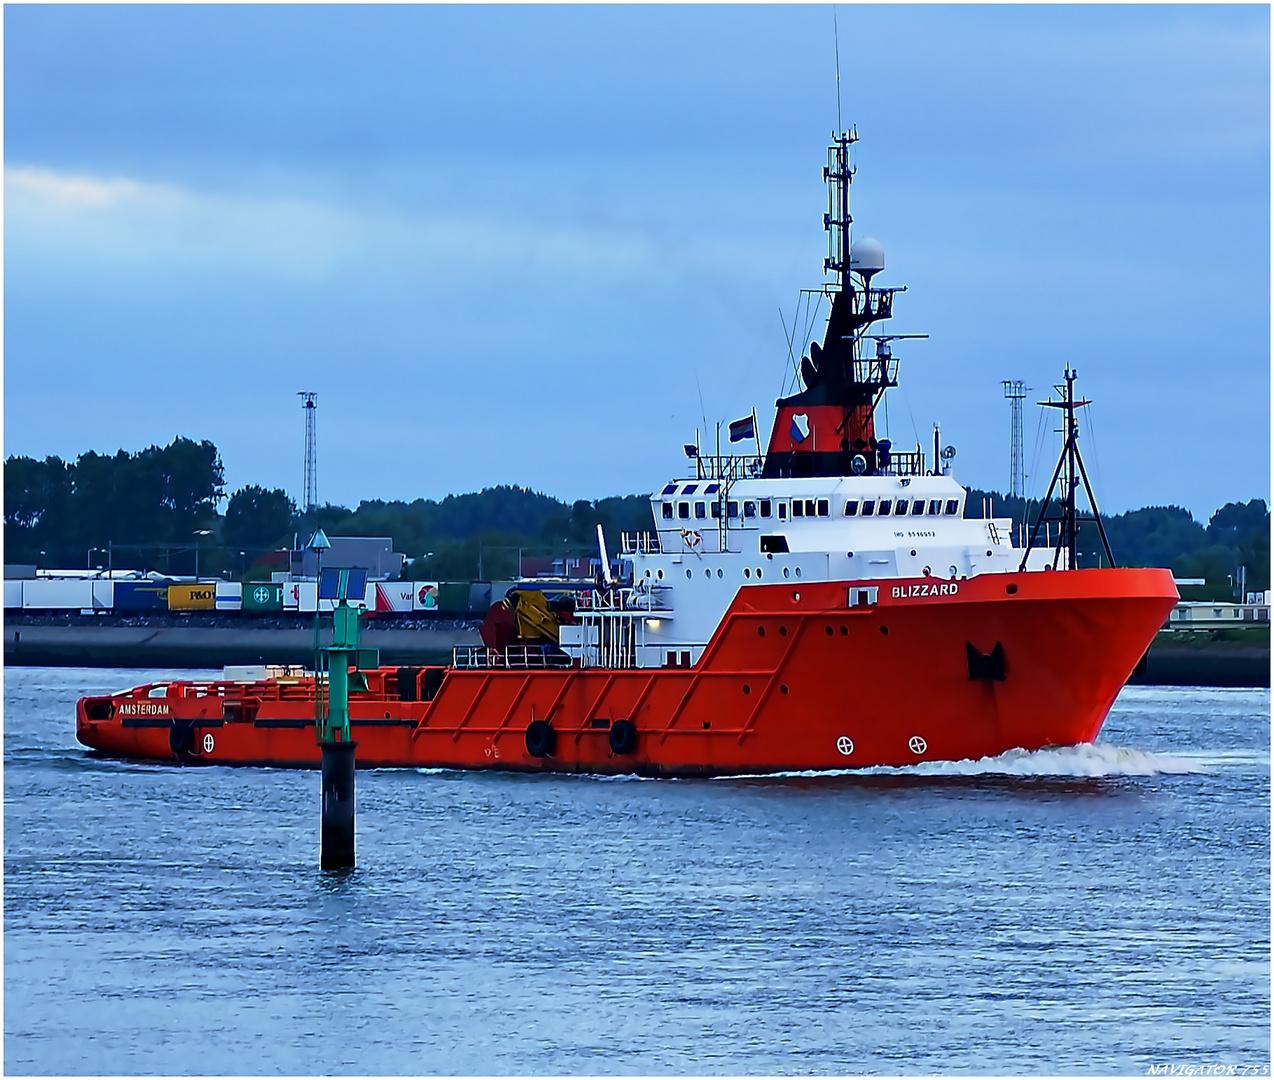 BLIZZARD / Tug/Supply Vessel / Rotterdam